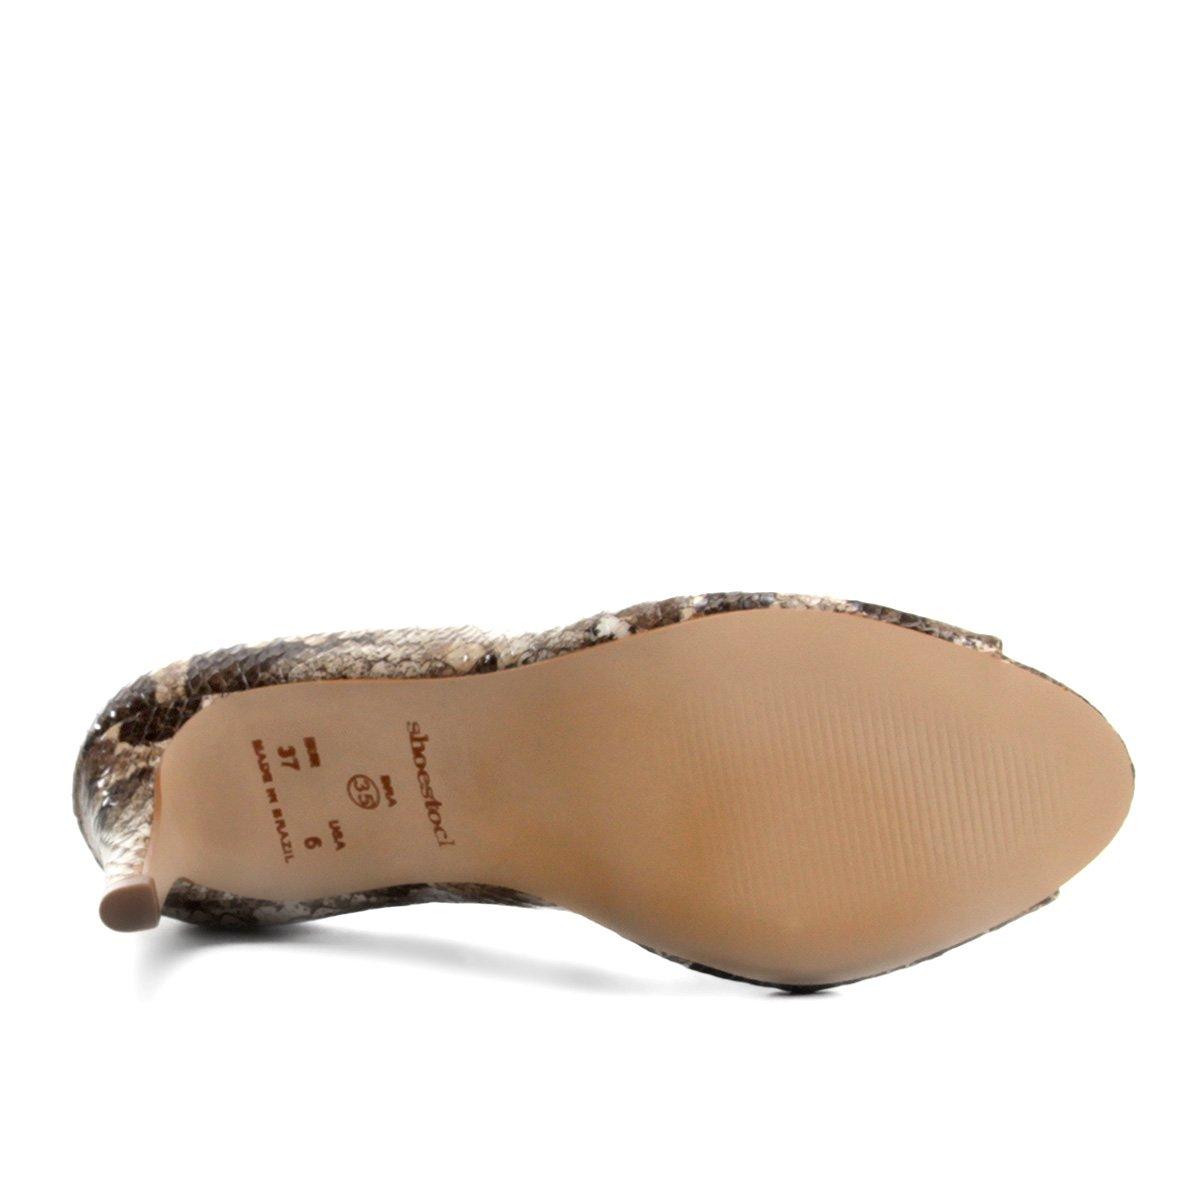 Shoestock Toe Shoestock Peep Couro Couro Peep Toe Cobra Salto Fino Cobra Salto xpdRfSRn